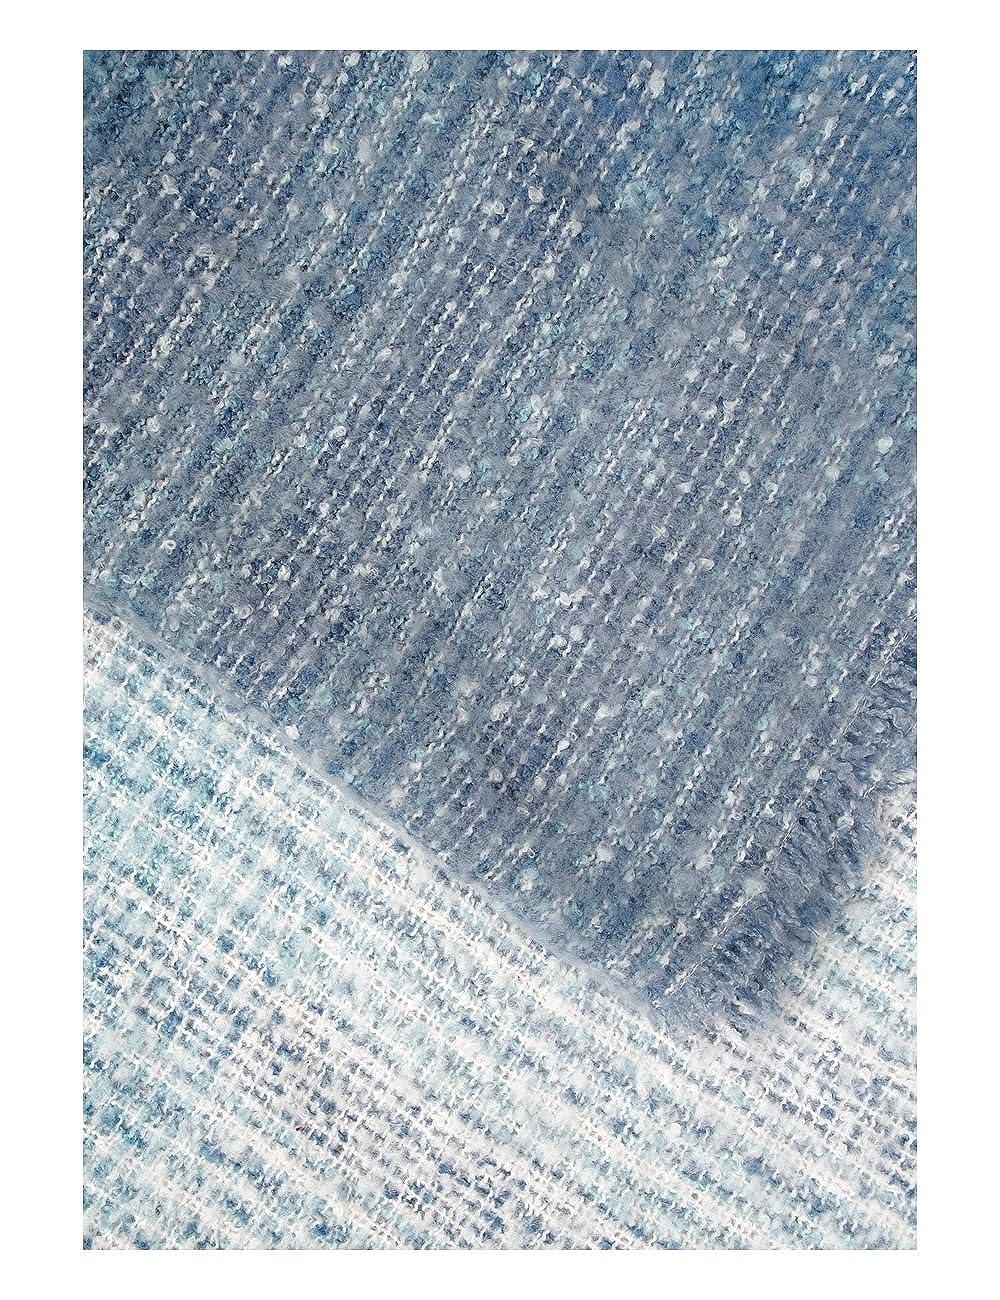 Sciarpa Donna Street One 570473 Taglia unica Ice Blue 31055 Blau